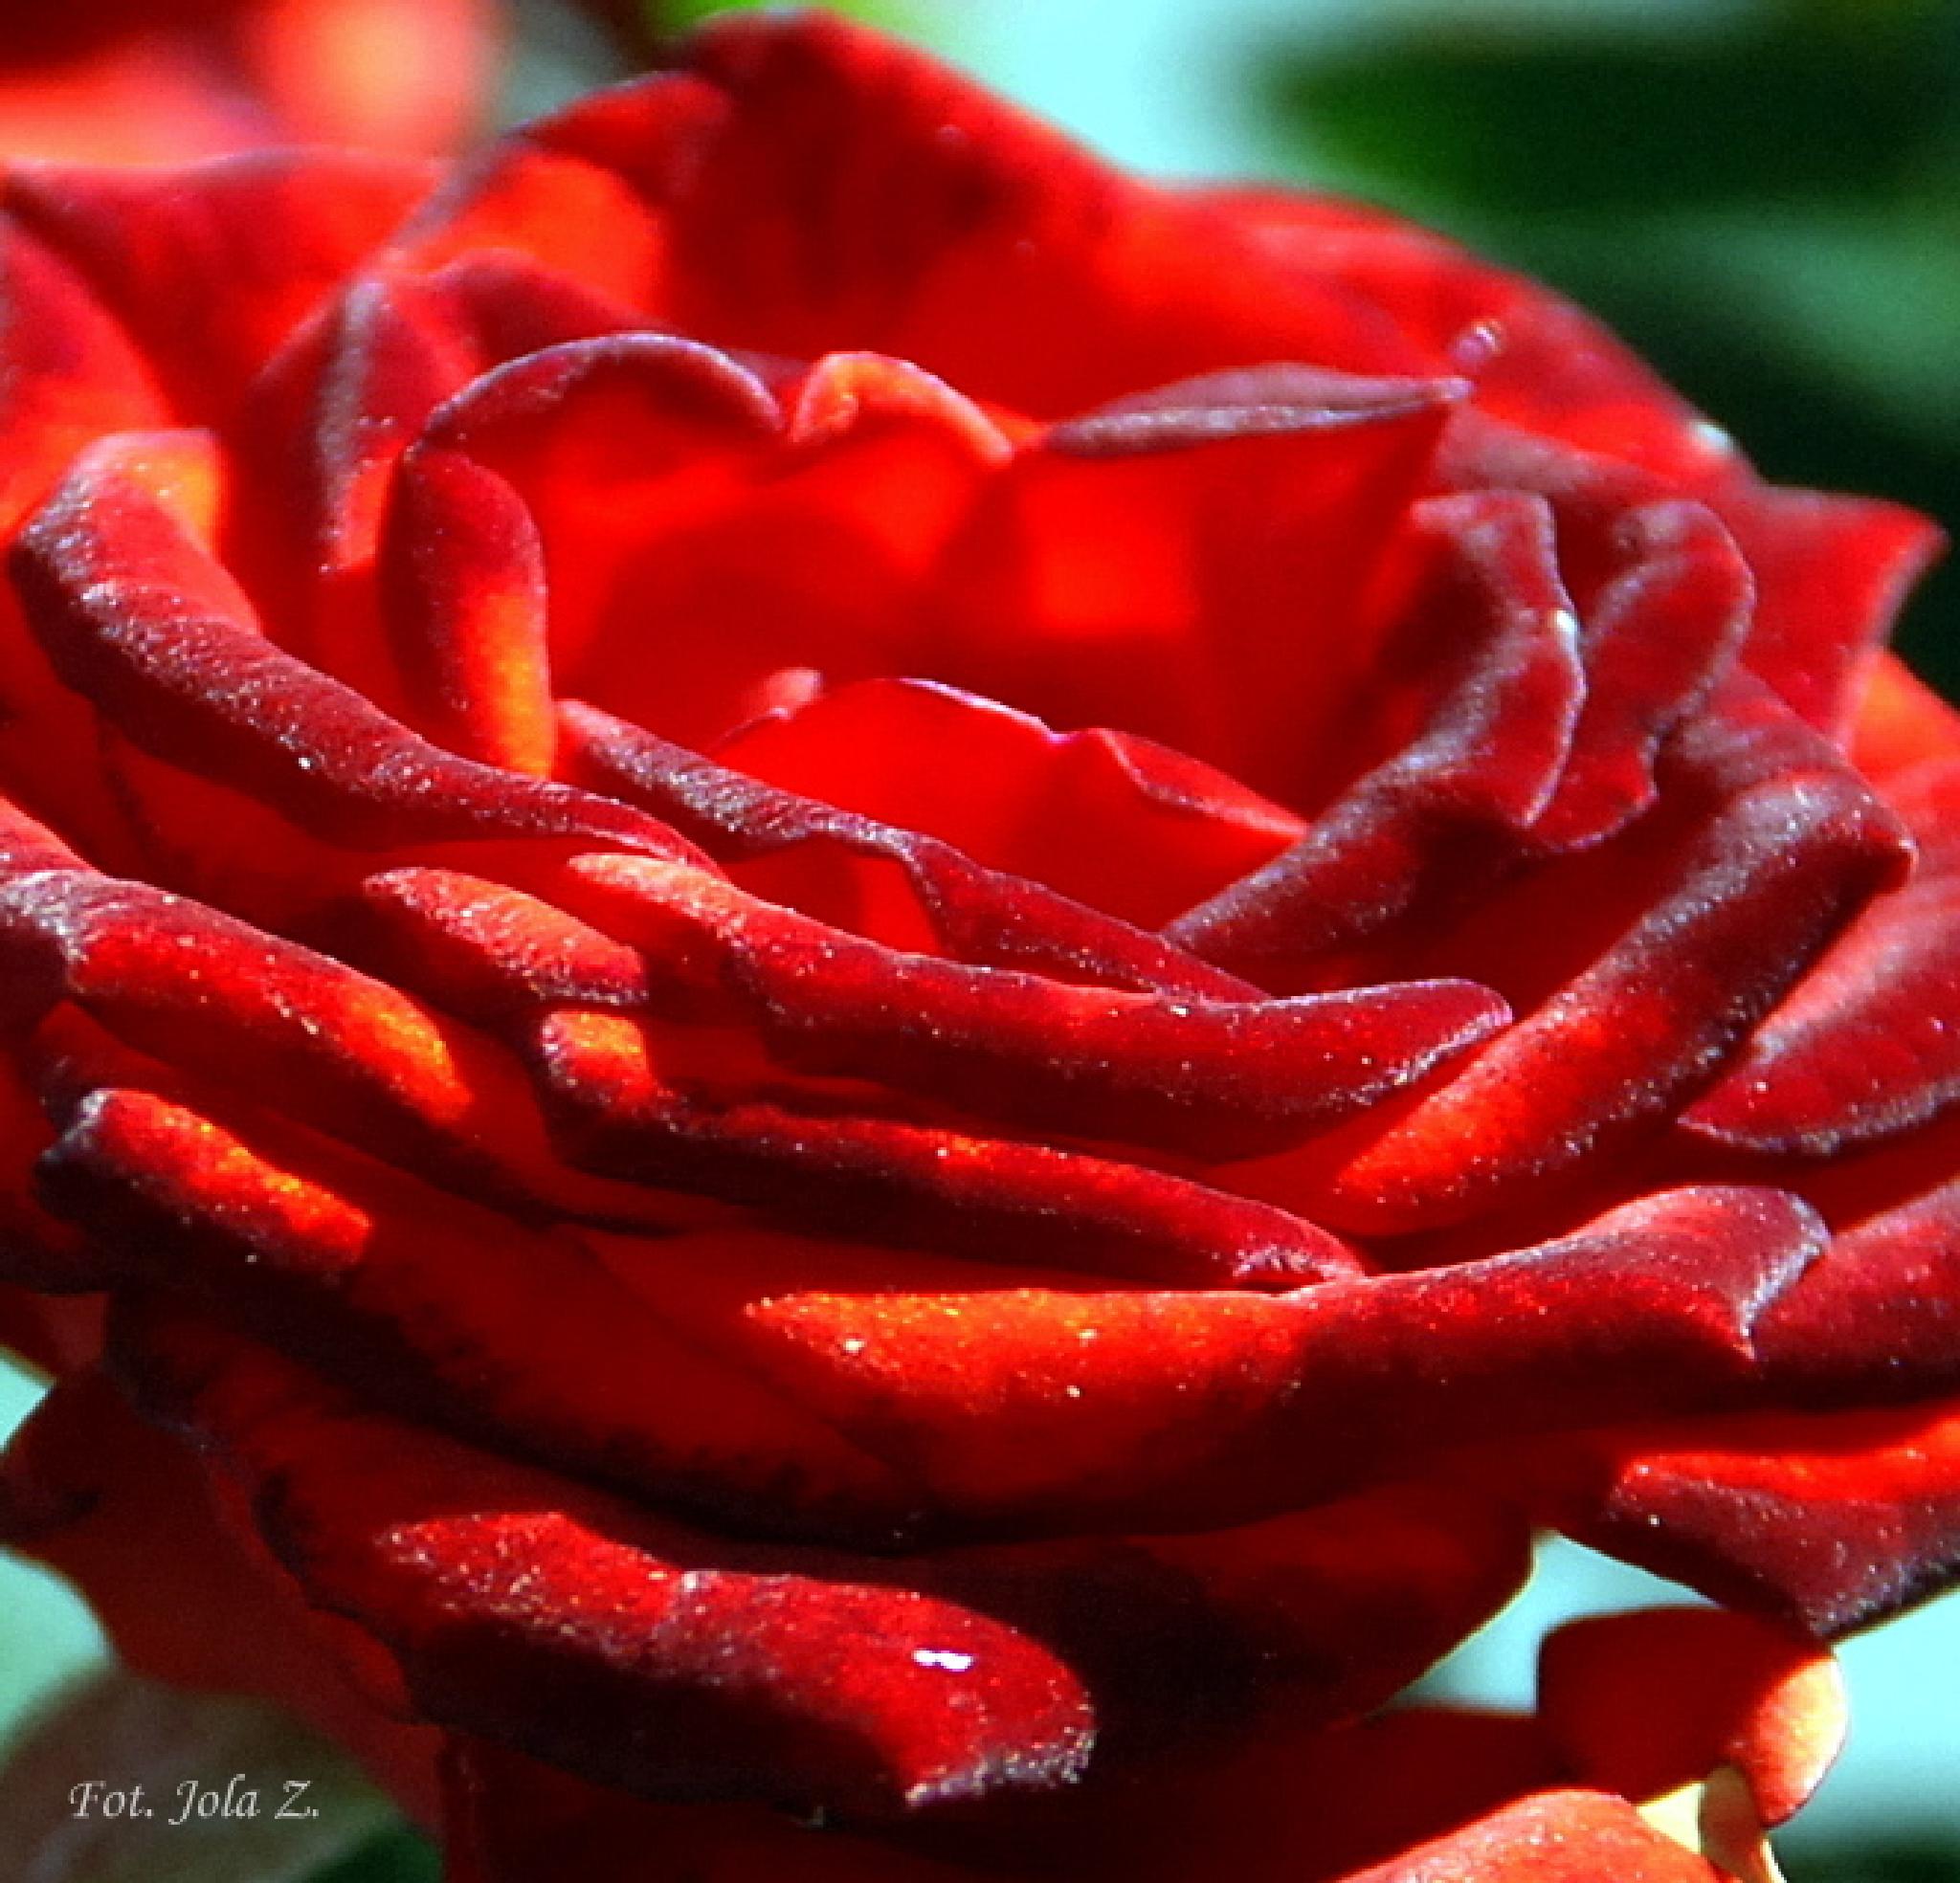 Rose 2 by jolanta.zuzel